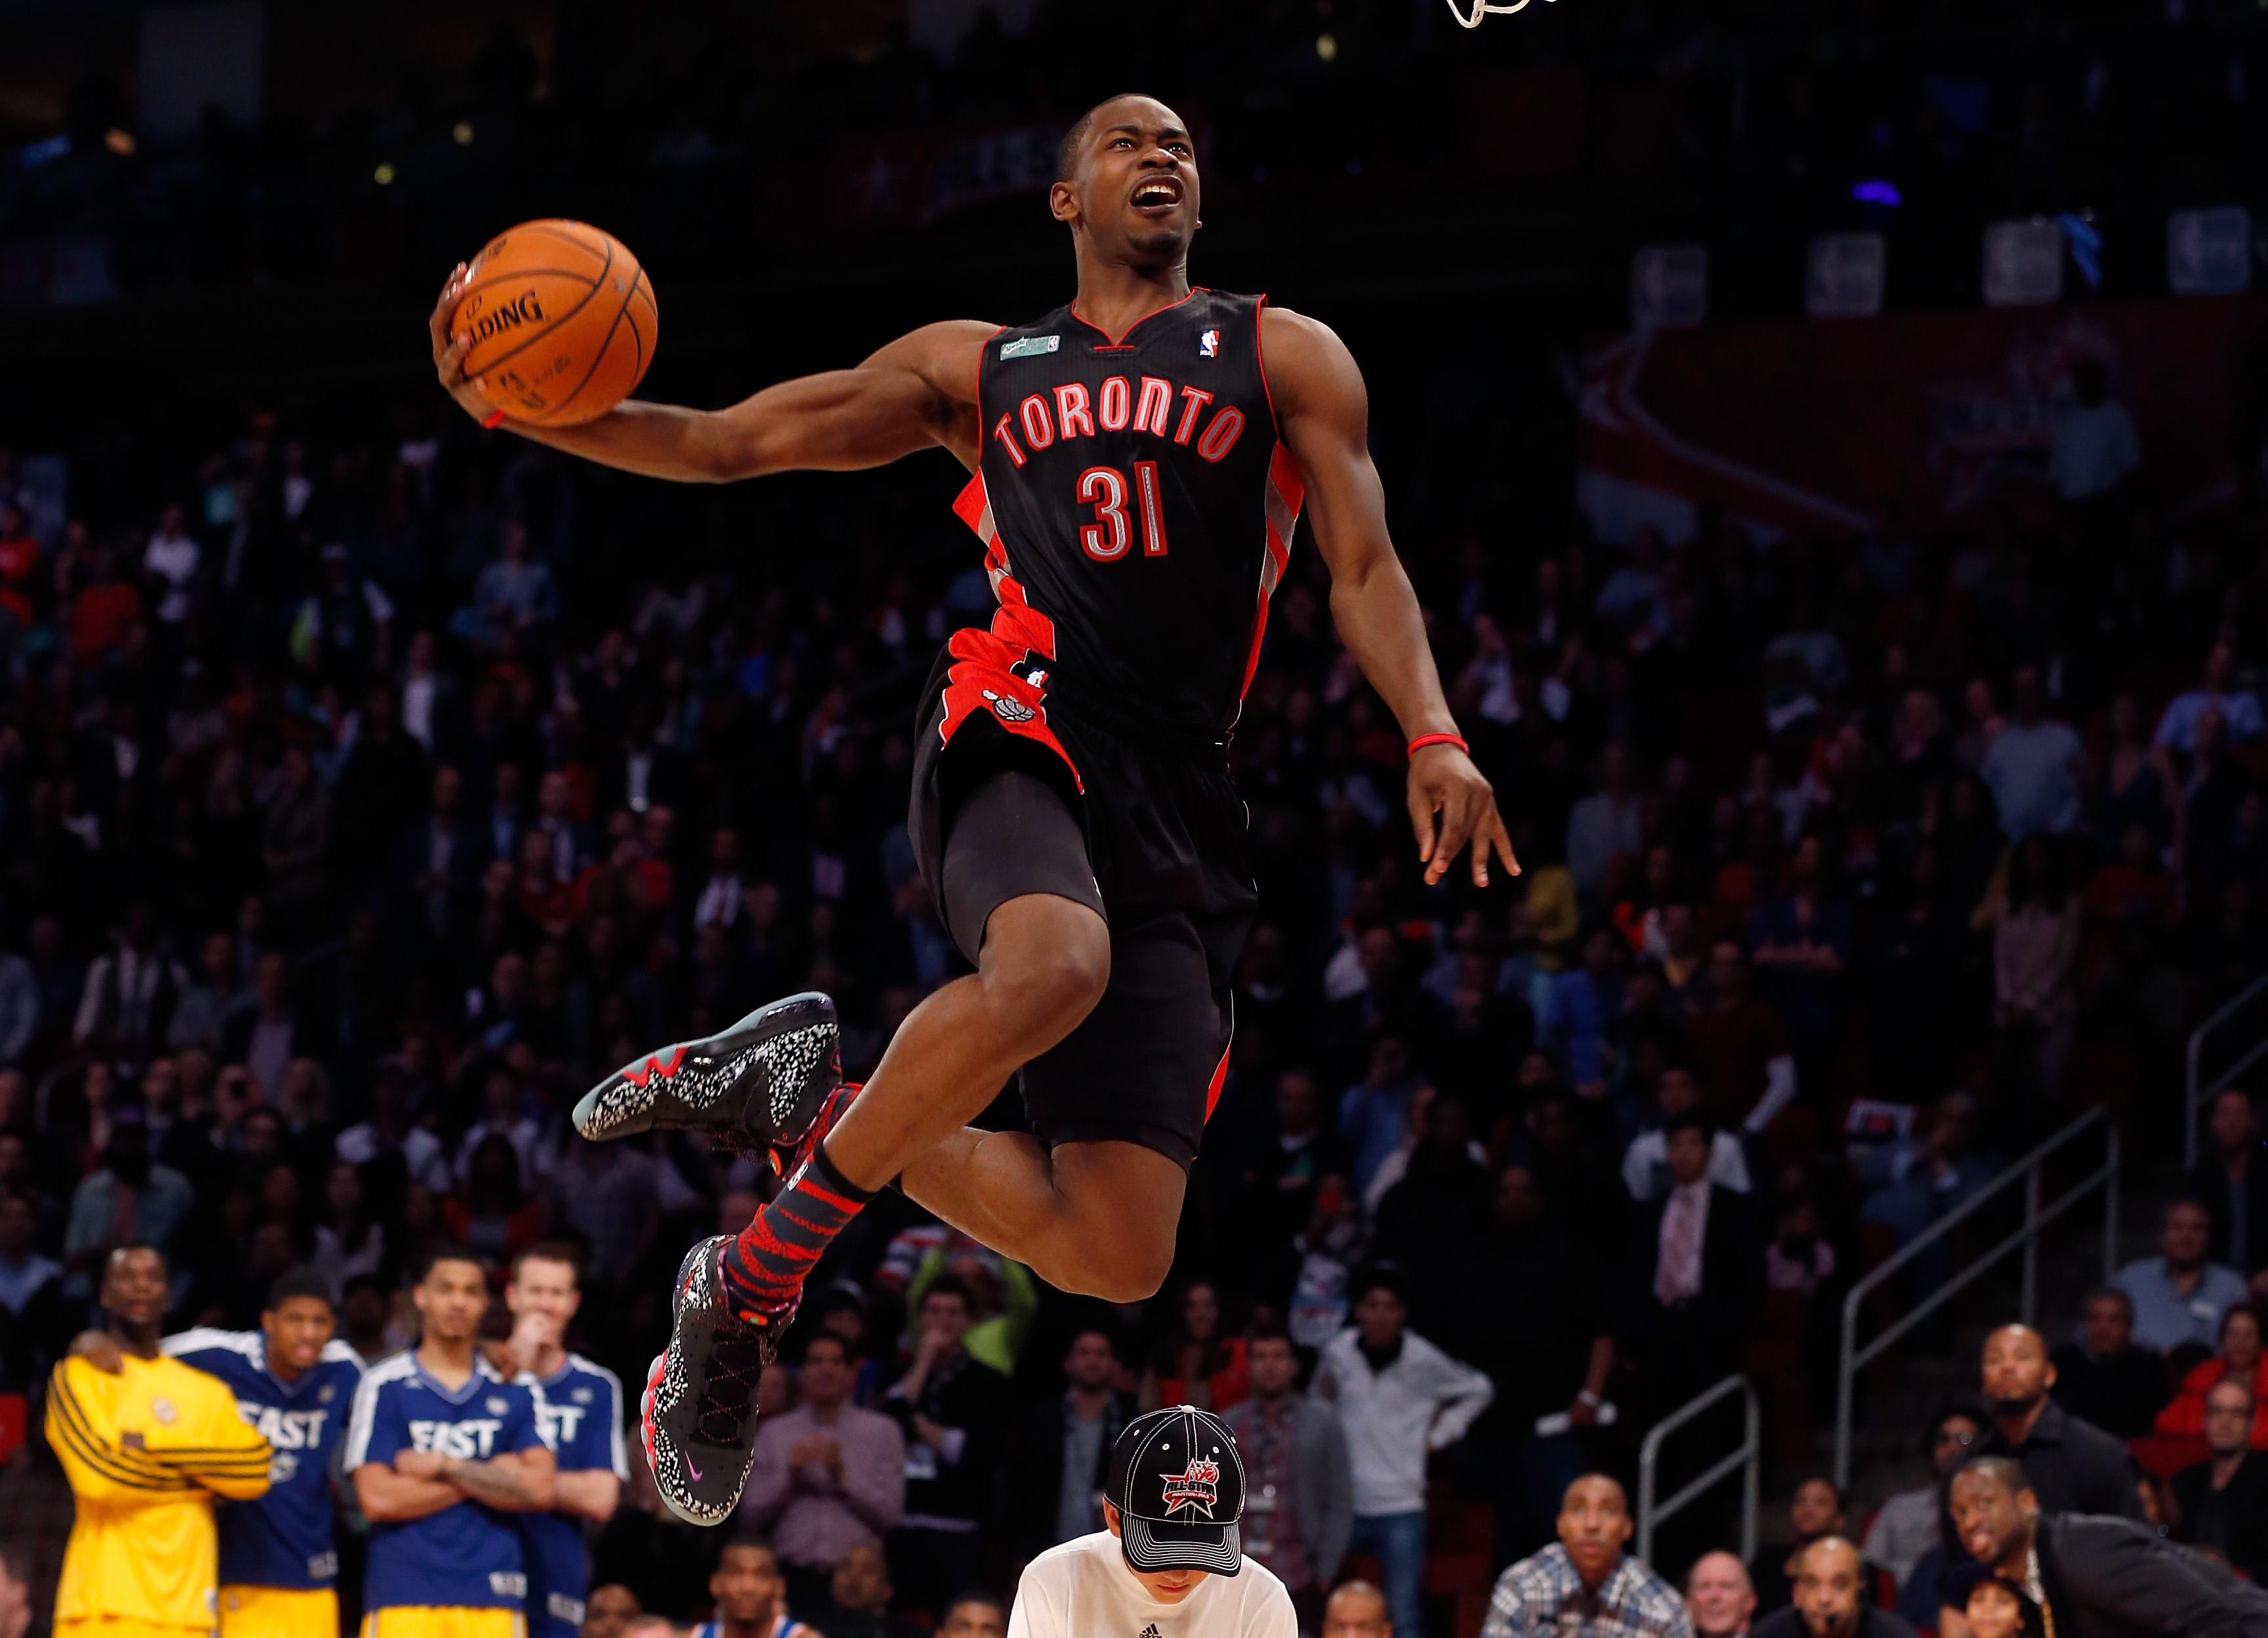 Raptors Basketball Wallpaper